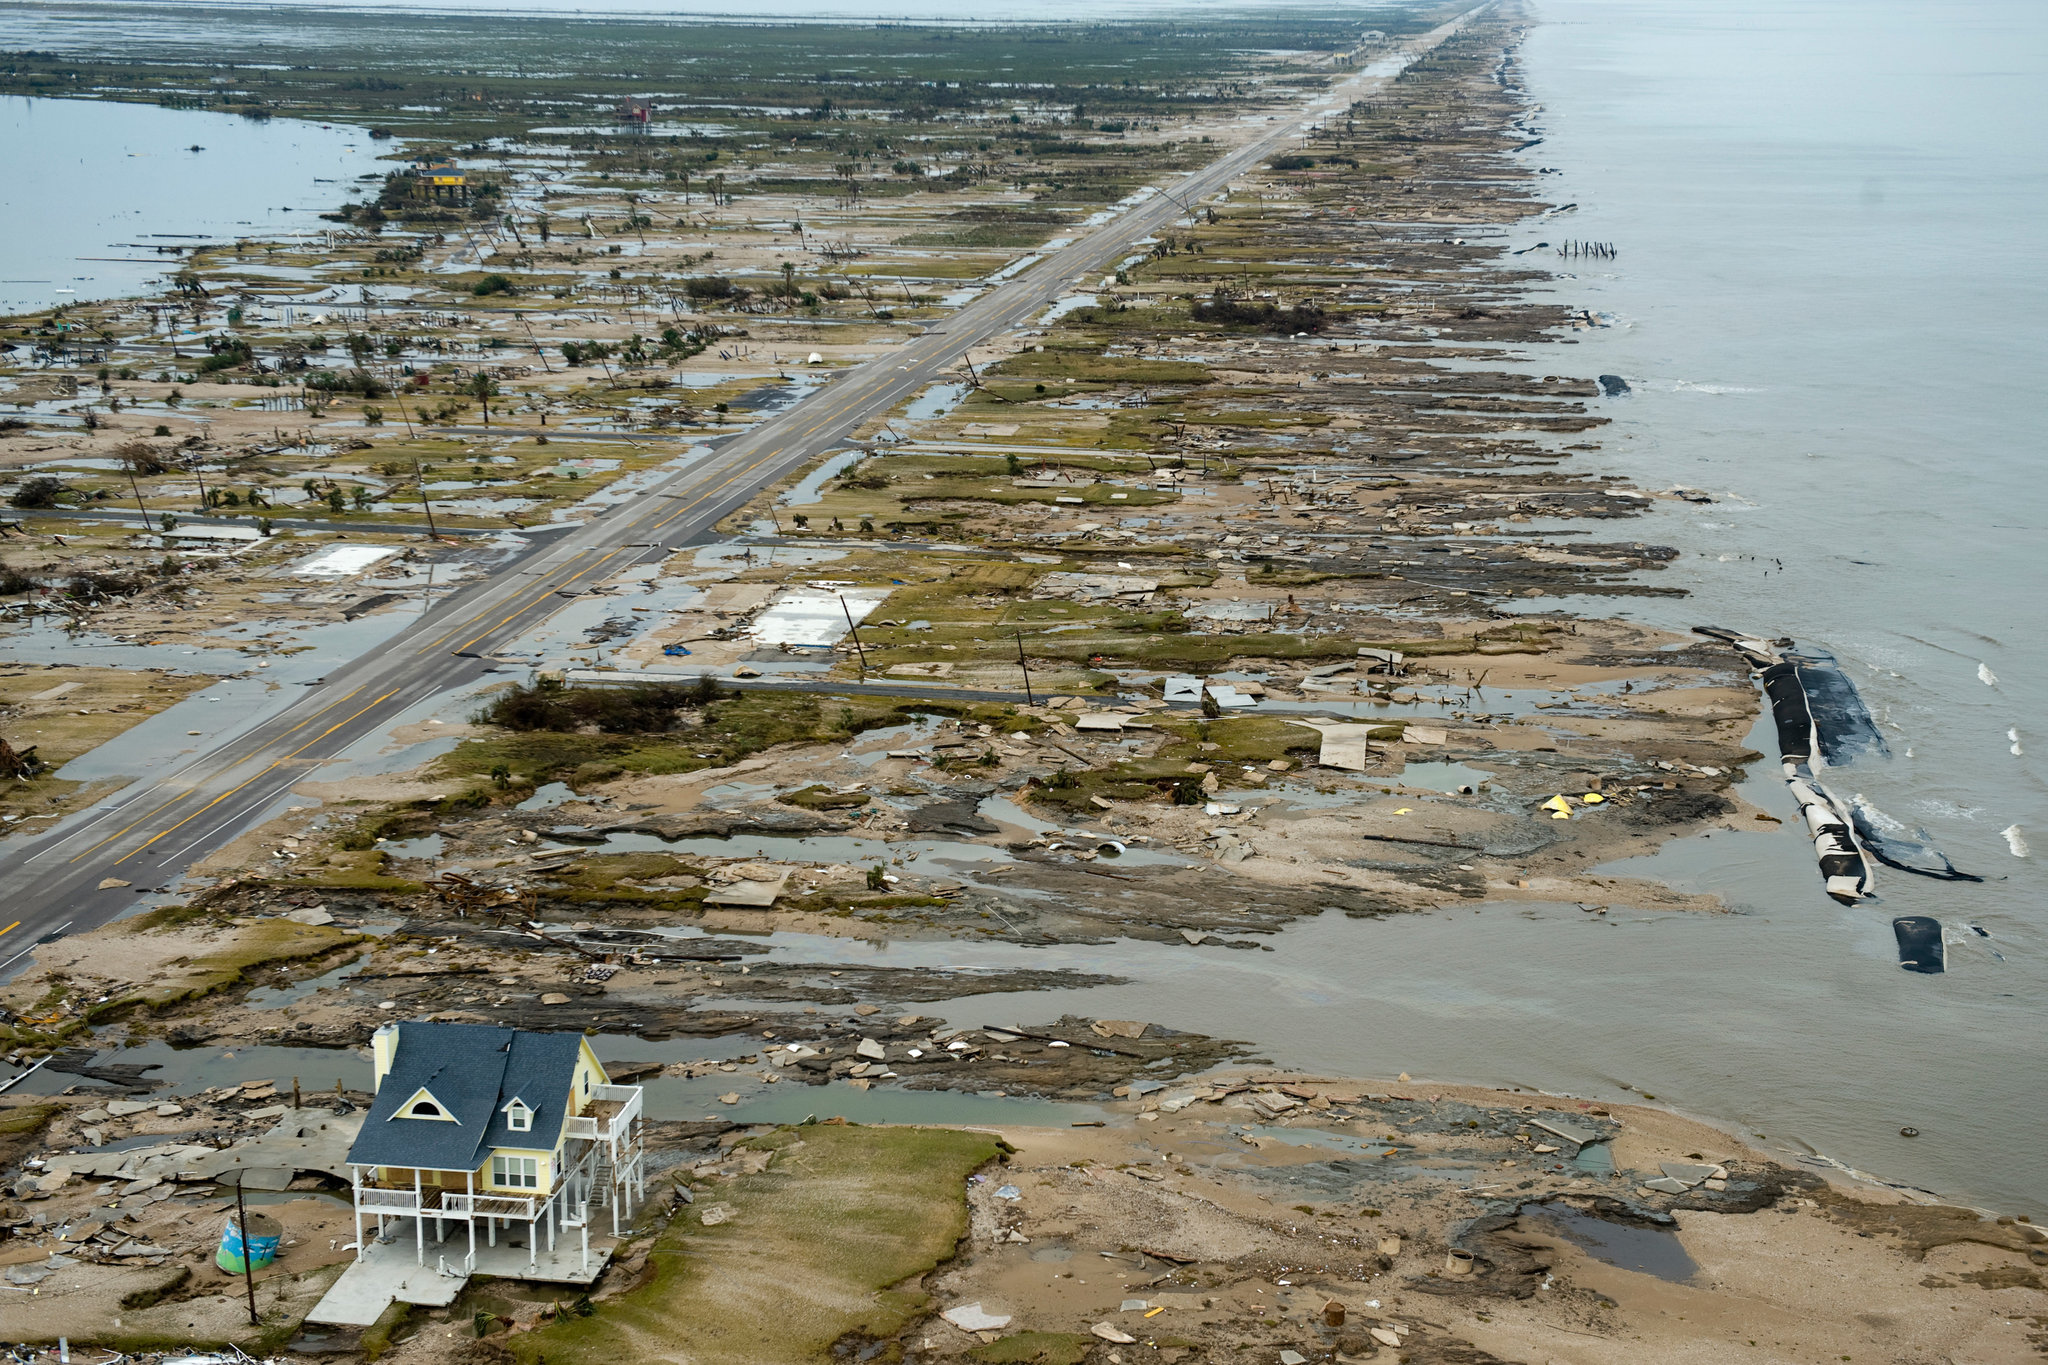 houston hurricane doom, houston not ready for next big storm, when the next hurricane hits texas, when the next hurricane hits houston, houston hurricane ready, Houston's next hurricane could be devastating